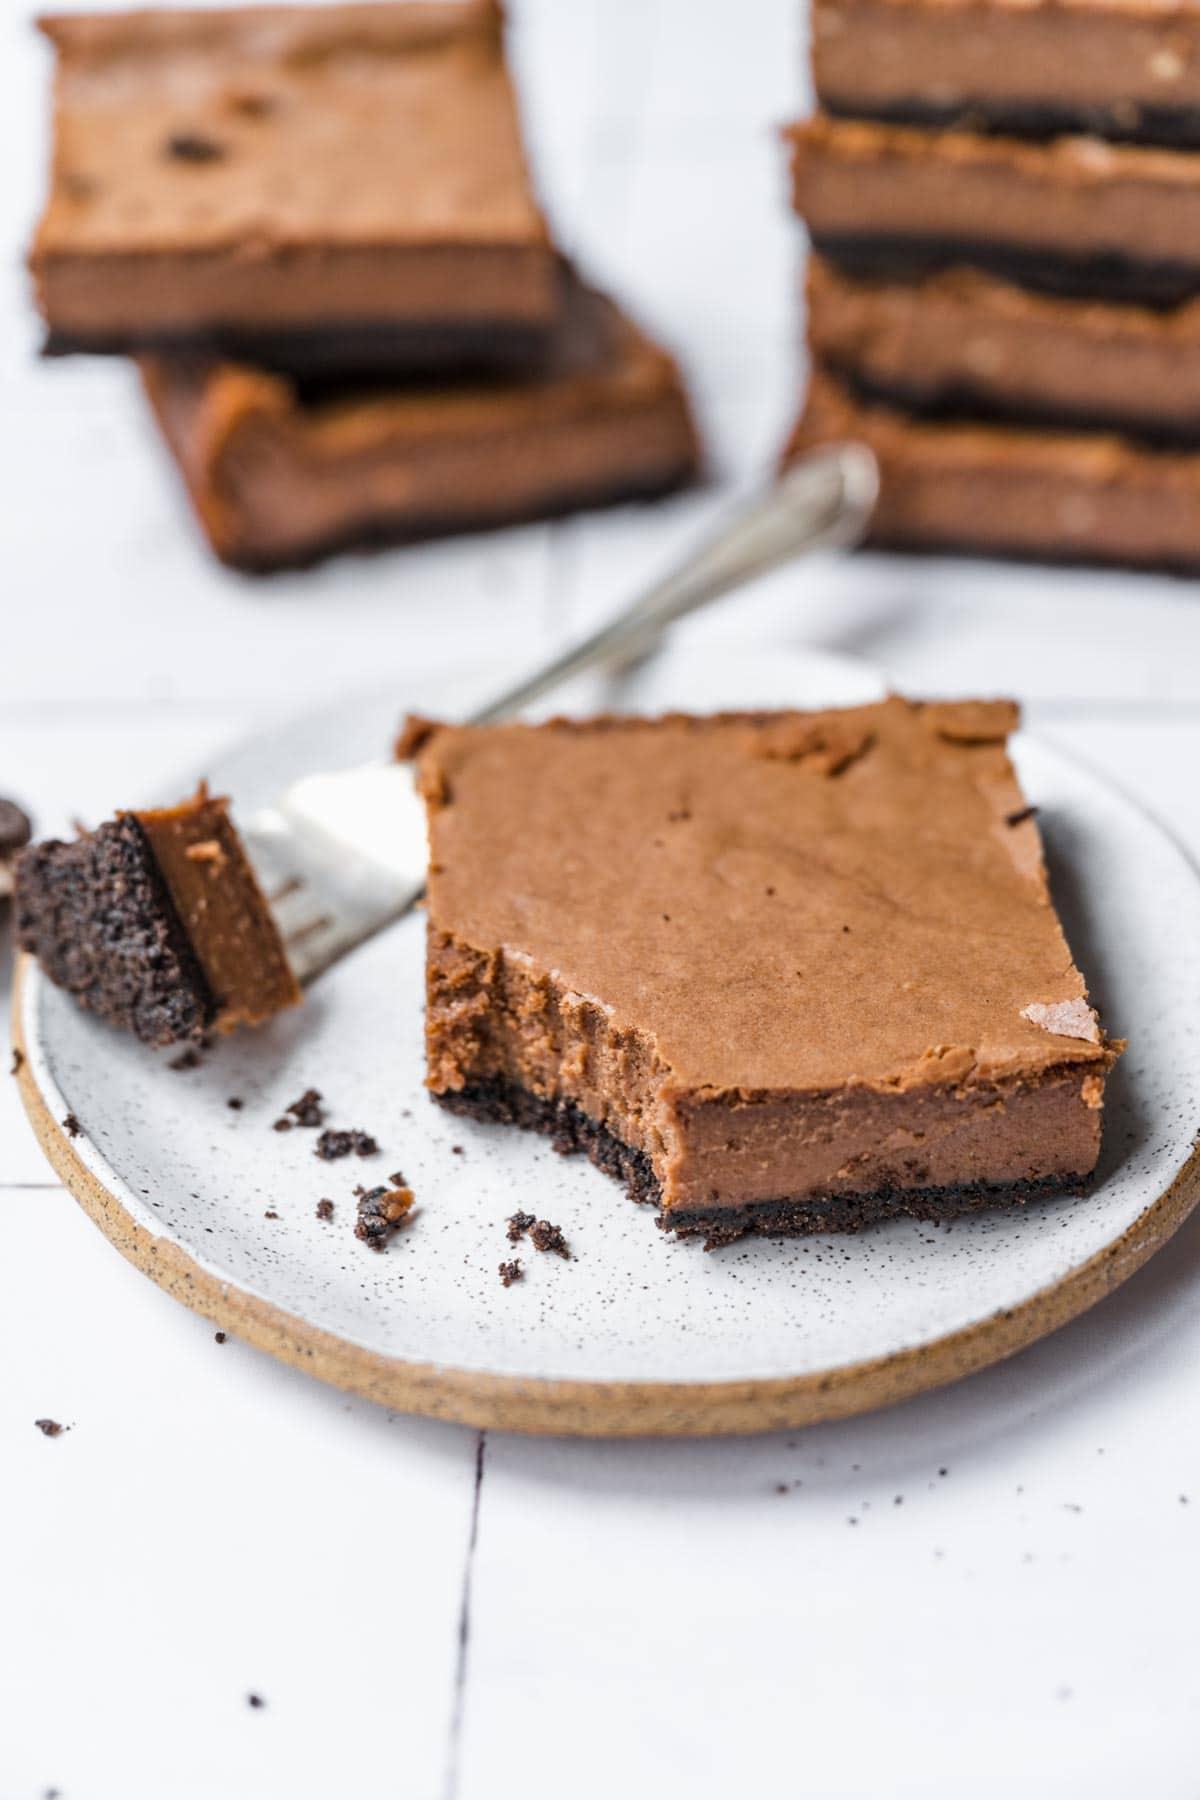 Chocolate Cheesecake Bars sliced on plate